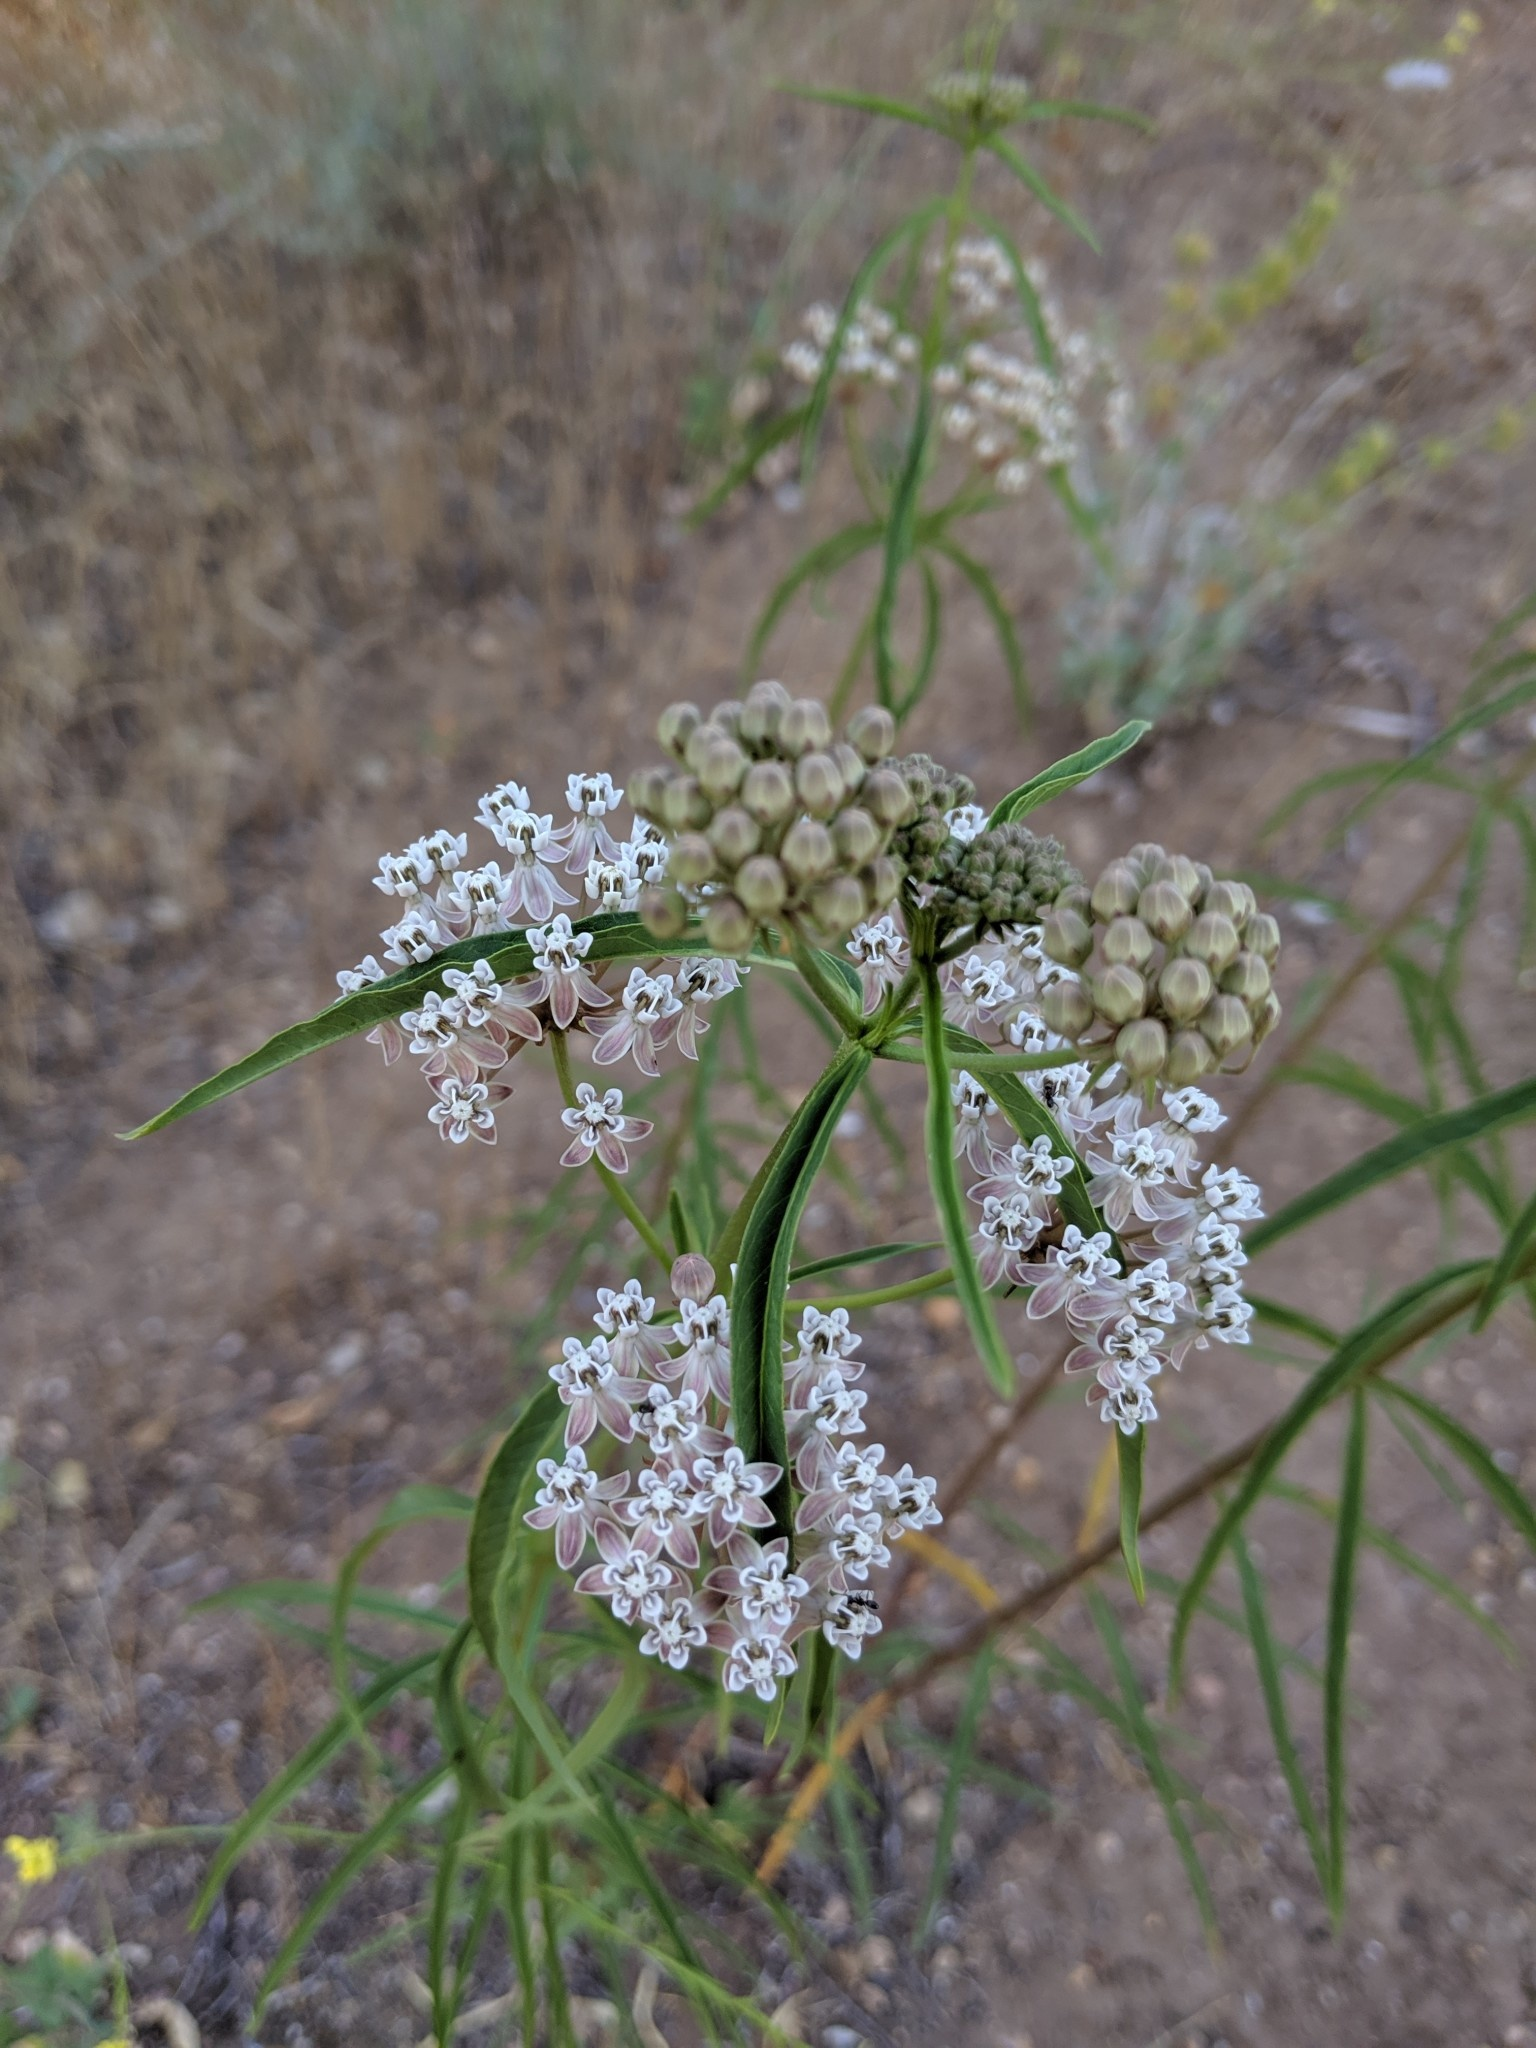 TPF Asclepias fascicularis - Narrowleaf Milkweed (Seed)